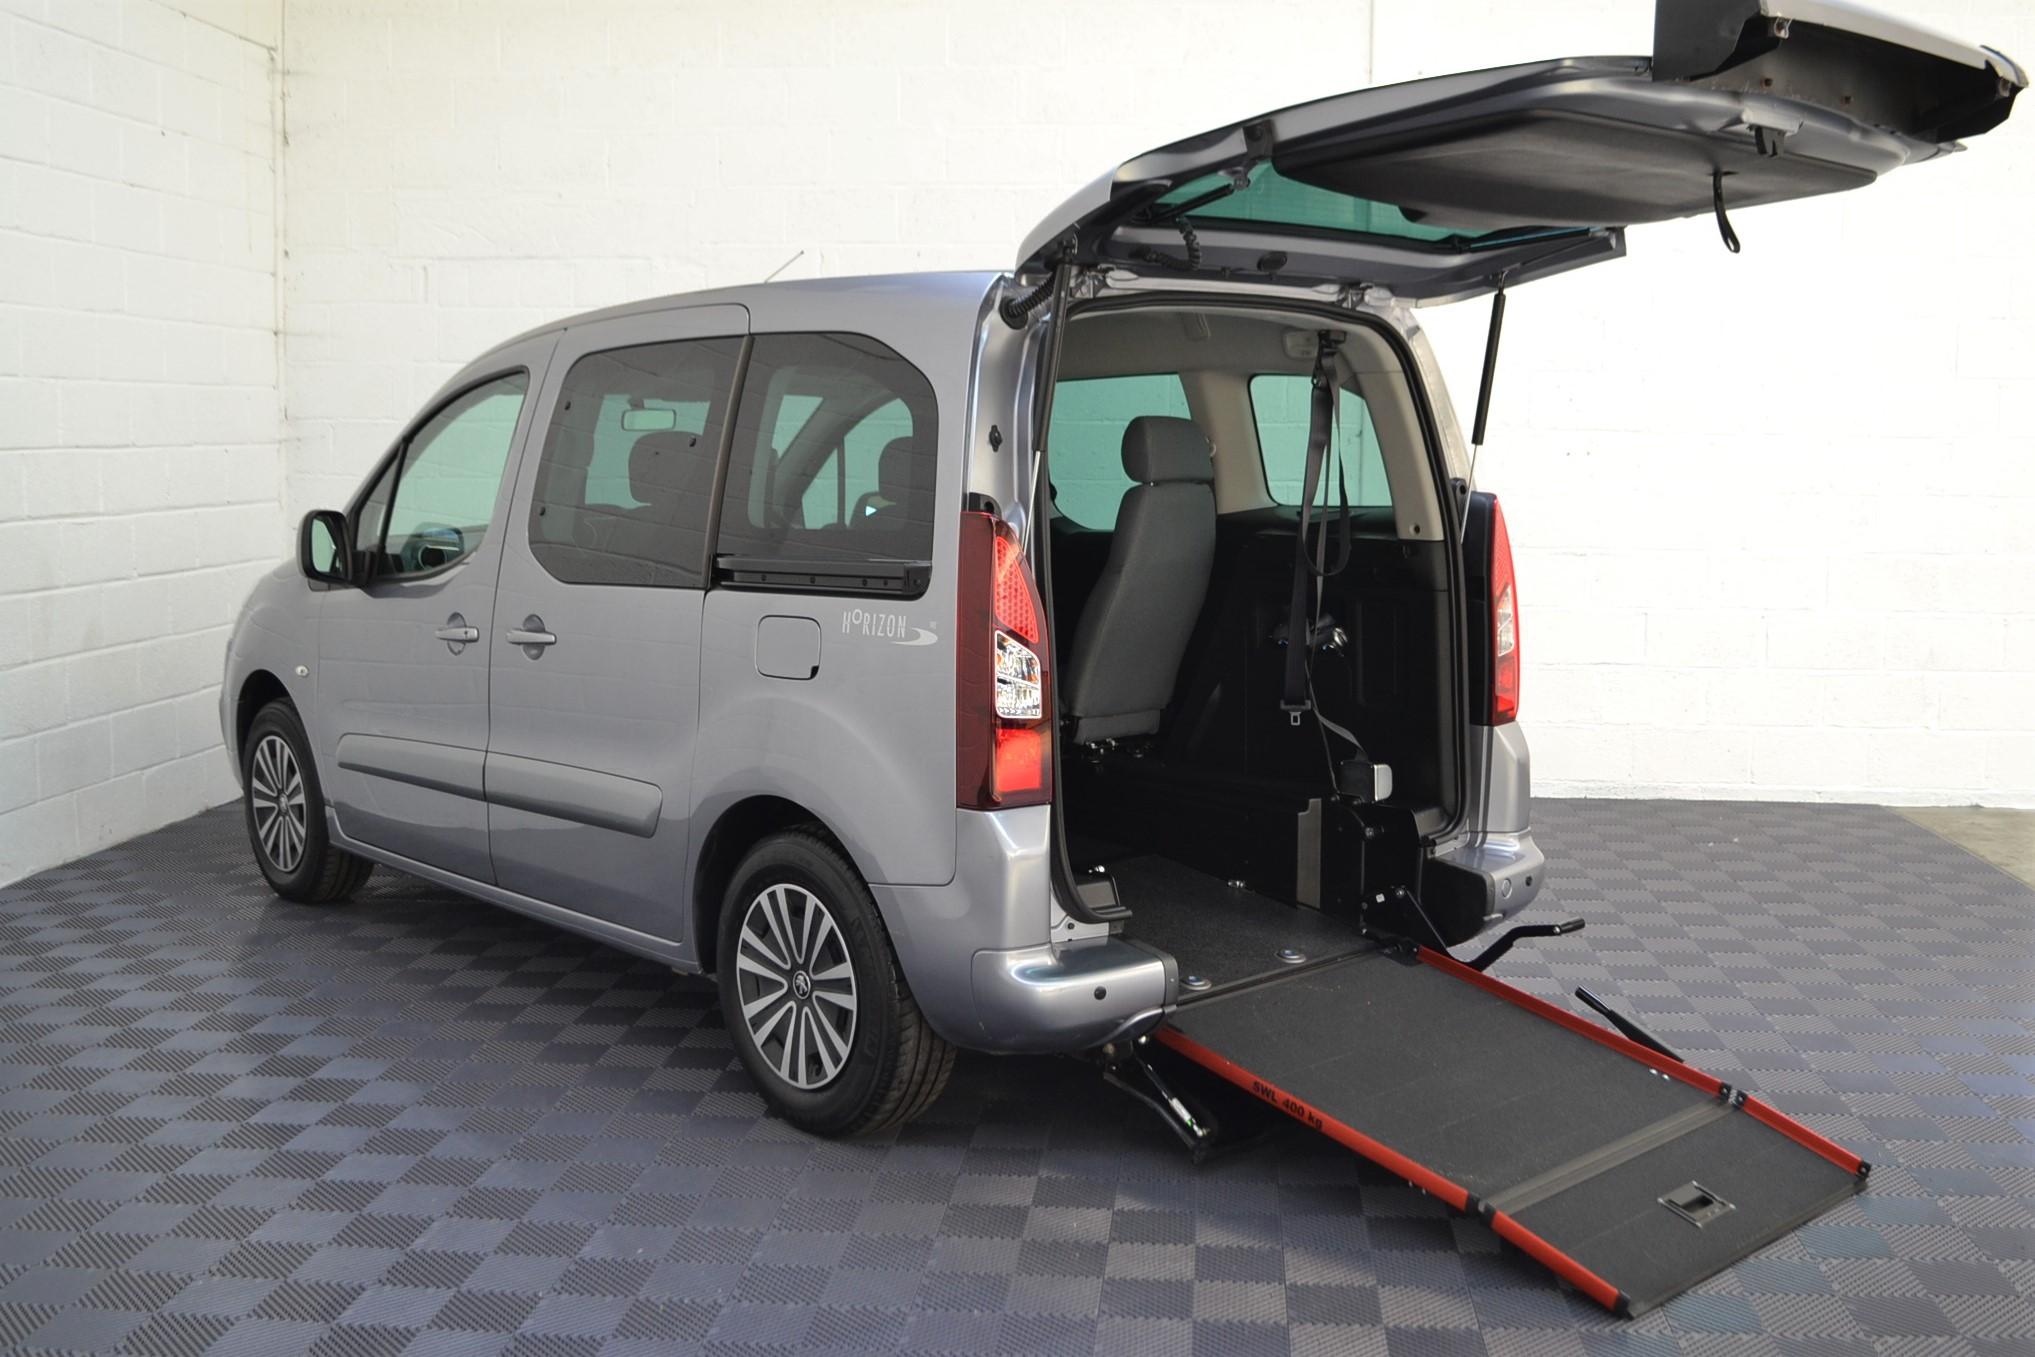 WAV Cars For Sale Bristol Wheelchair Accessible Vehicles Used For Sale Somerset Devon Dorset Bath Peugeot Partner Auto 7